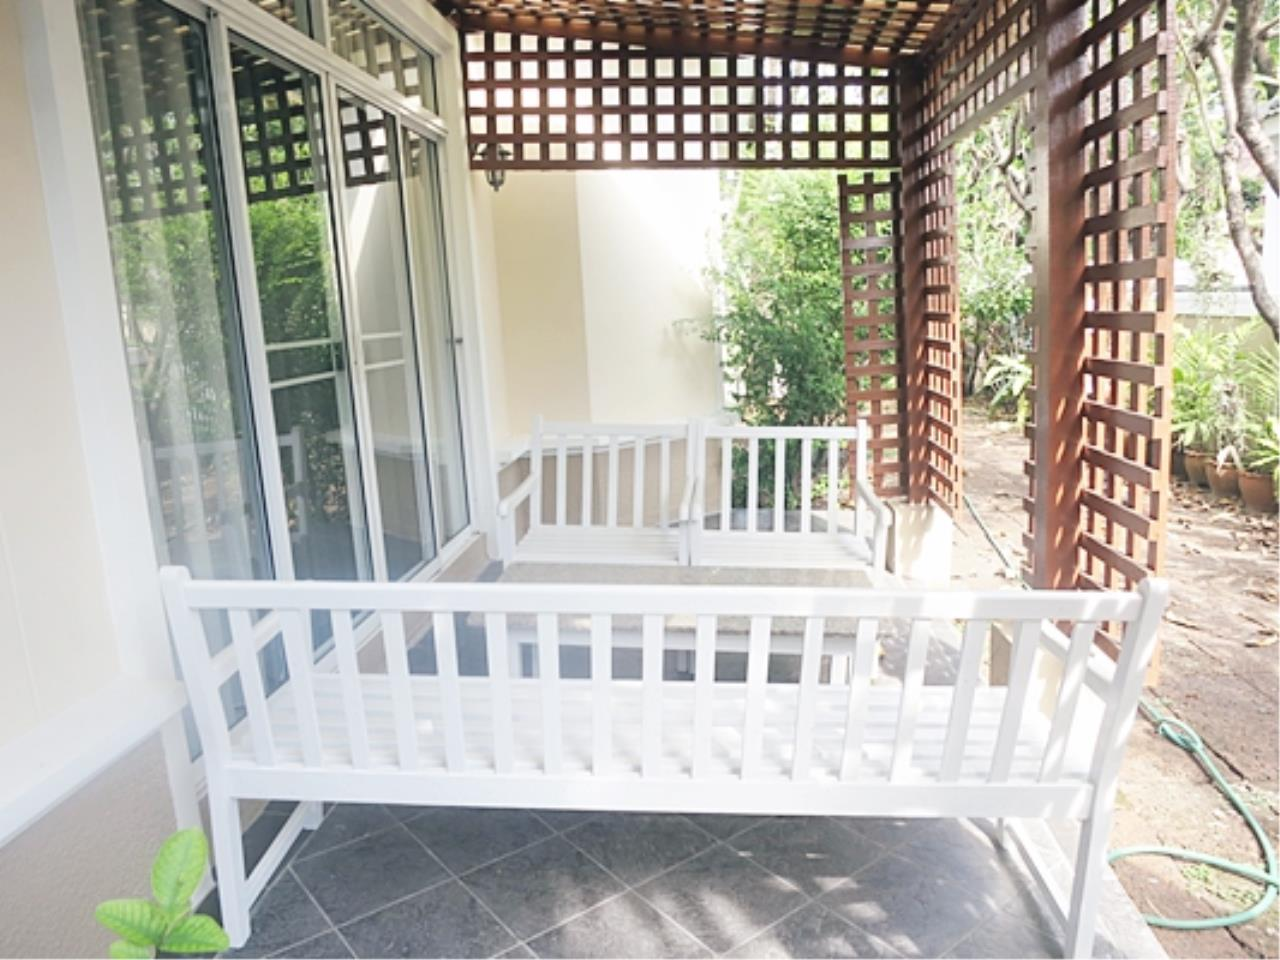 Estate Corner Agency (Samut Prakan) Agency's Single house for sale Ladprao, fully furnished. 13